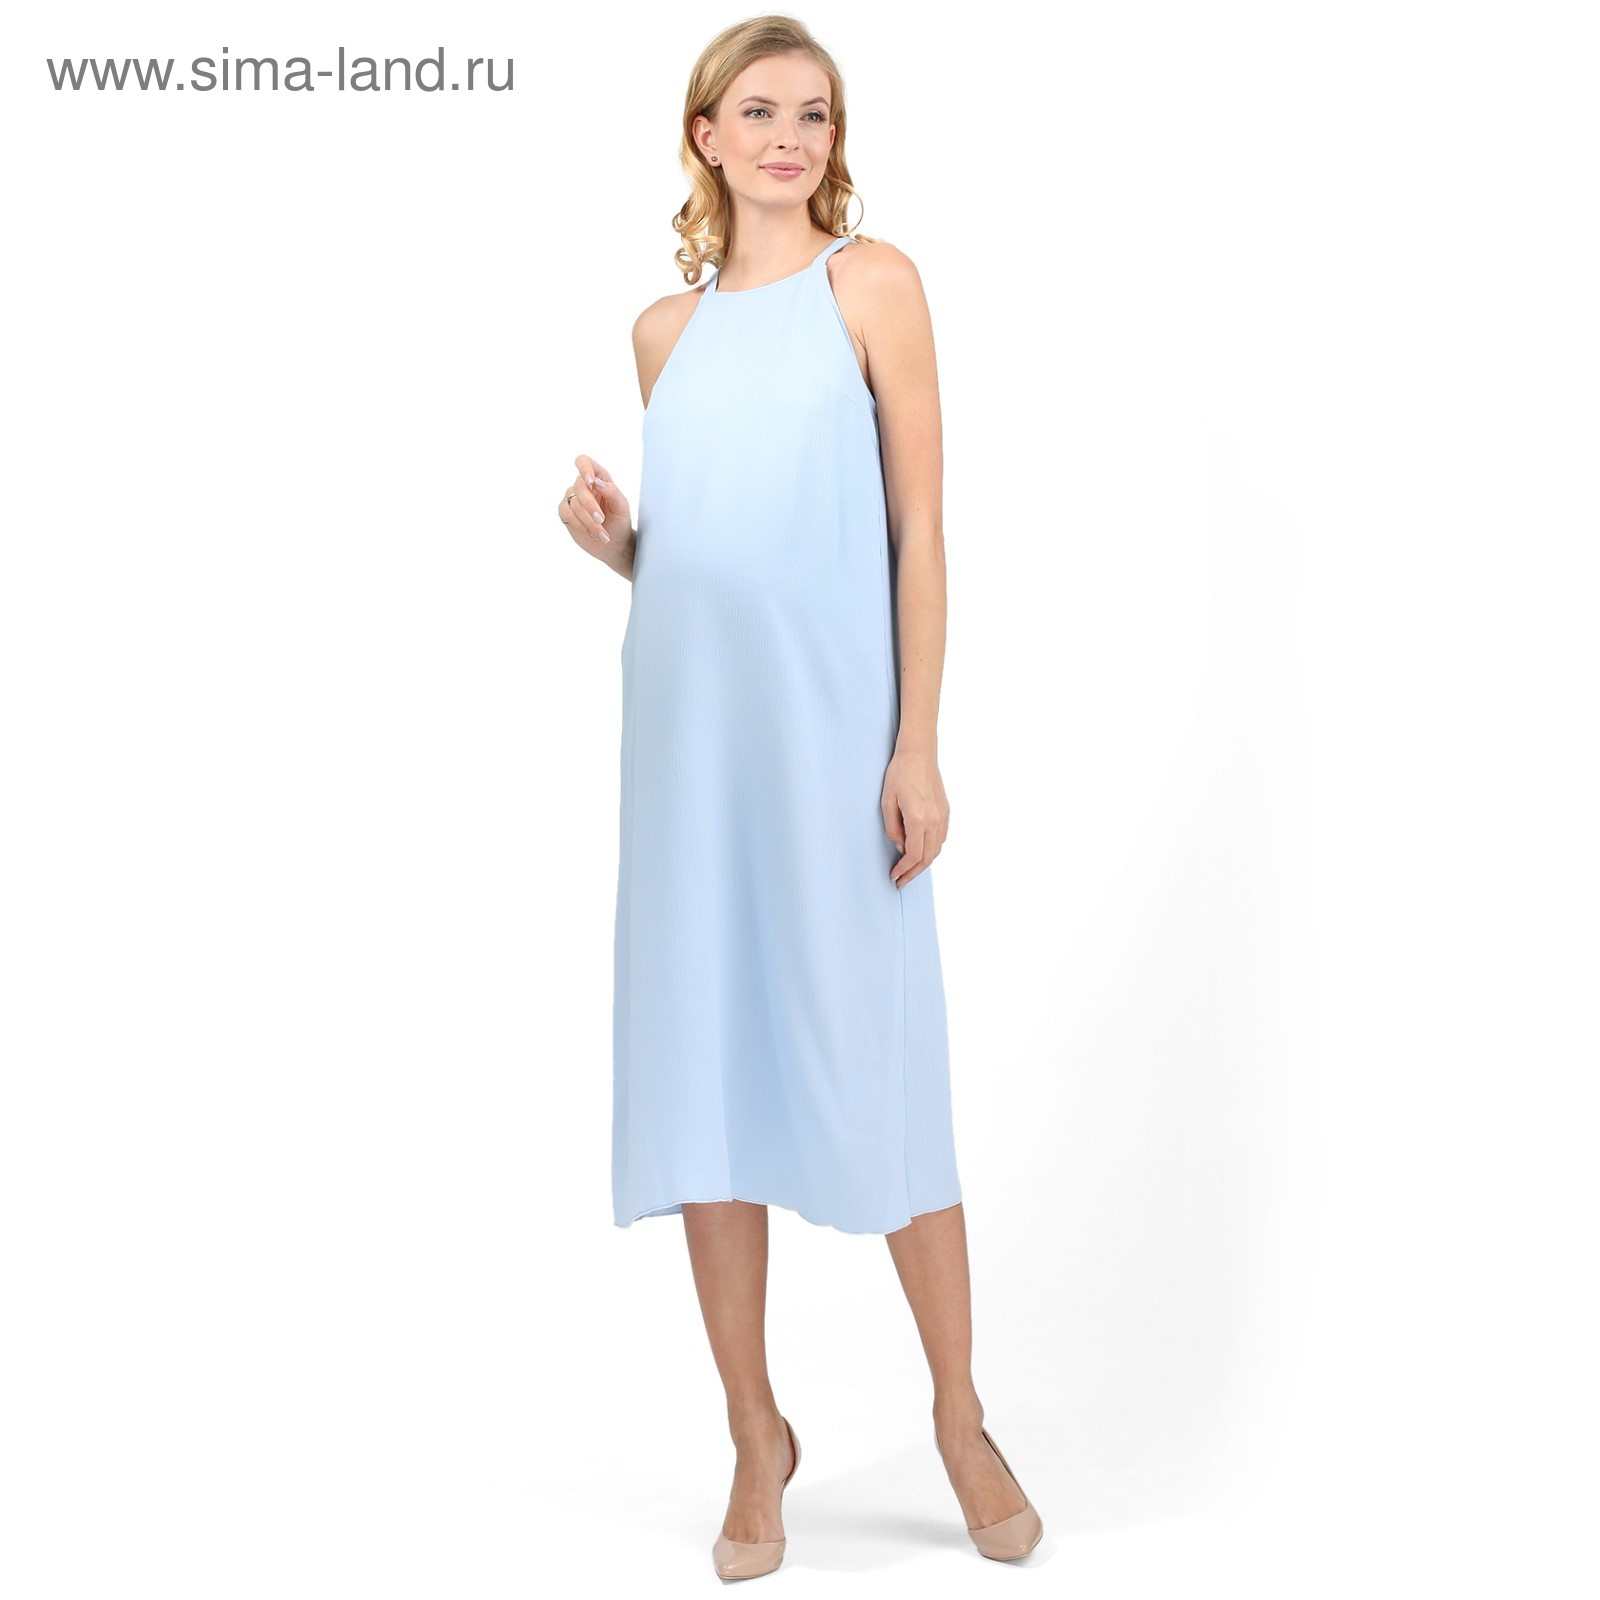 Сарафан для беременных цвет голубой aae8188df7f5f